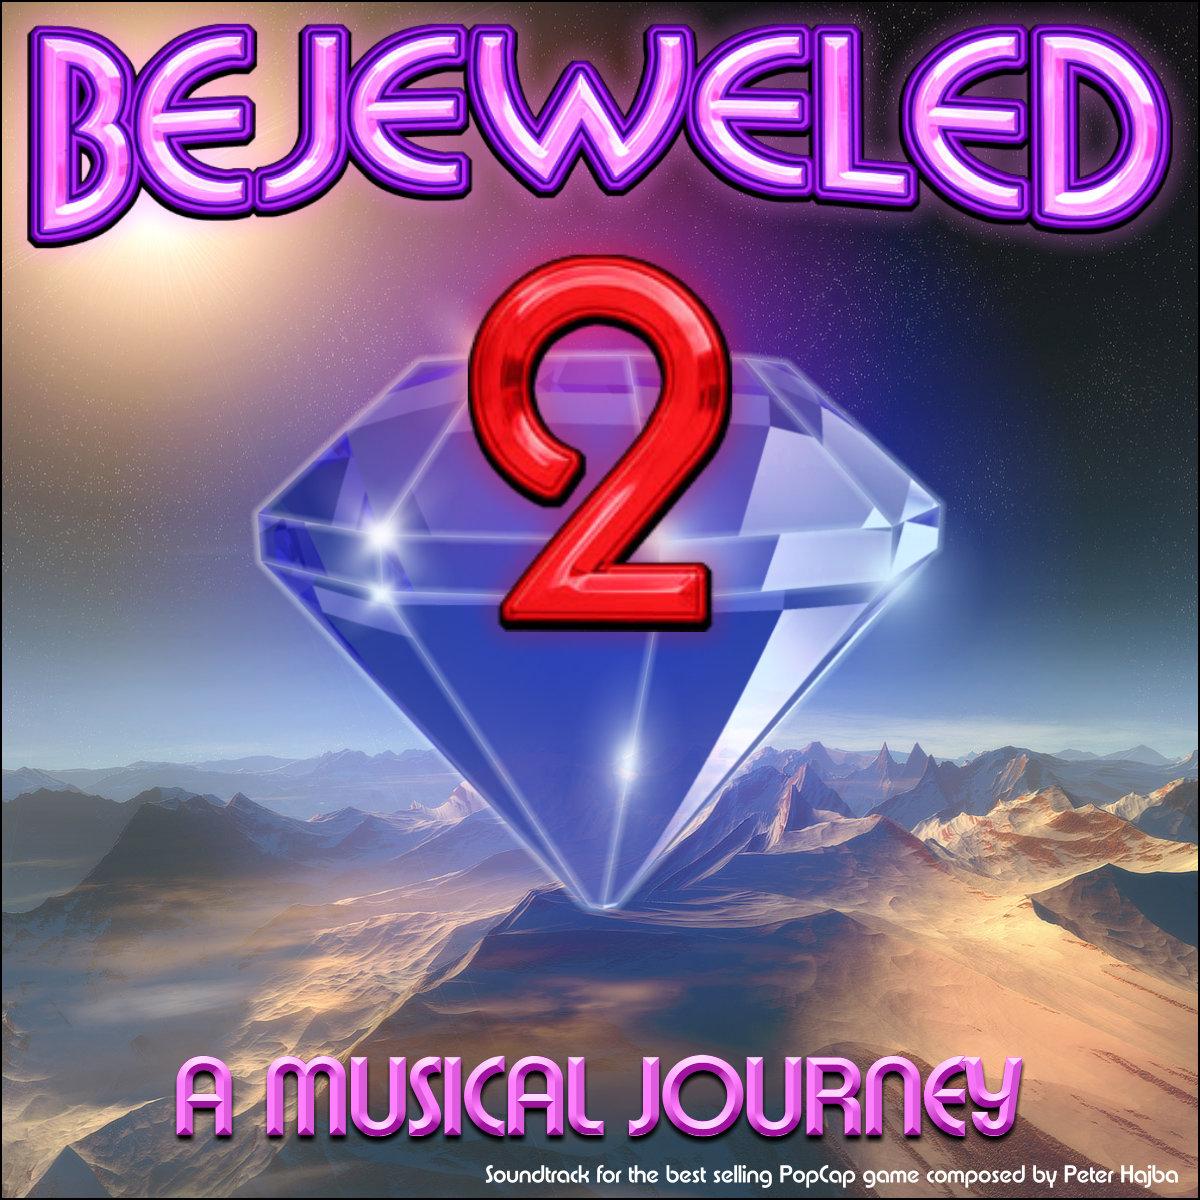 descargar bejeweled 3 para android apk